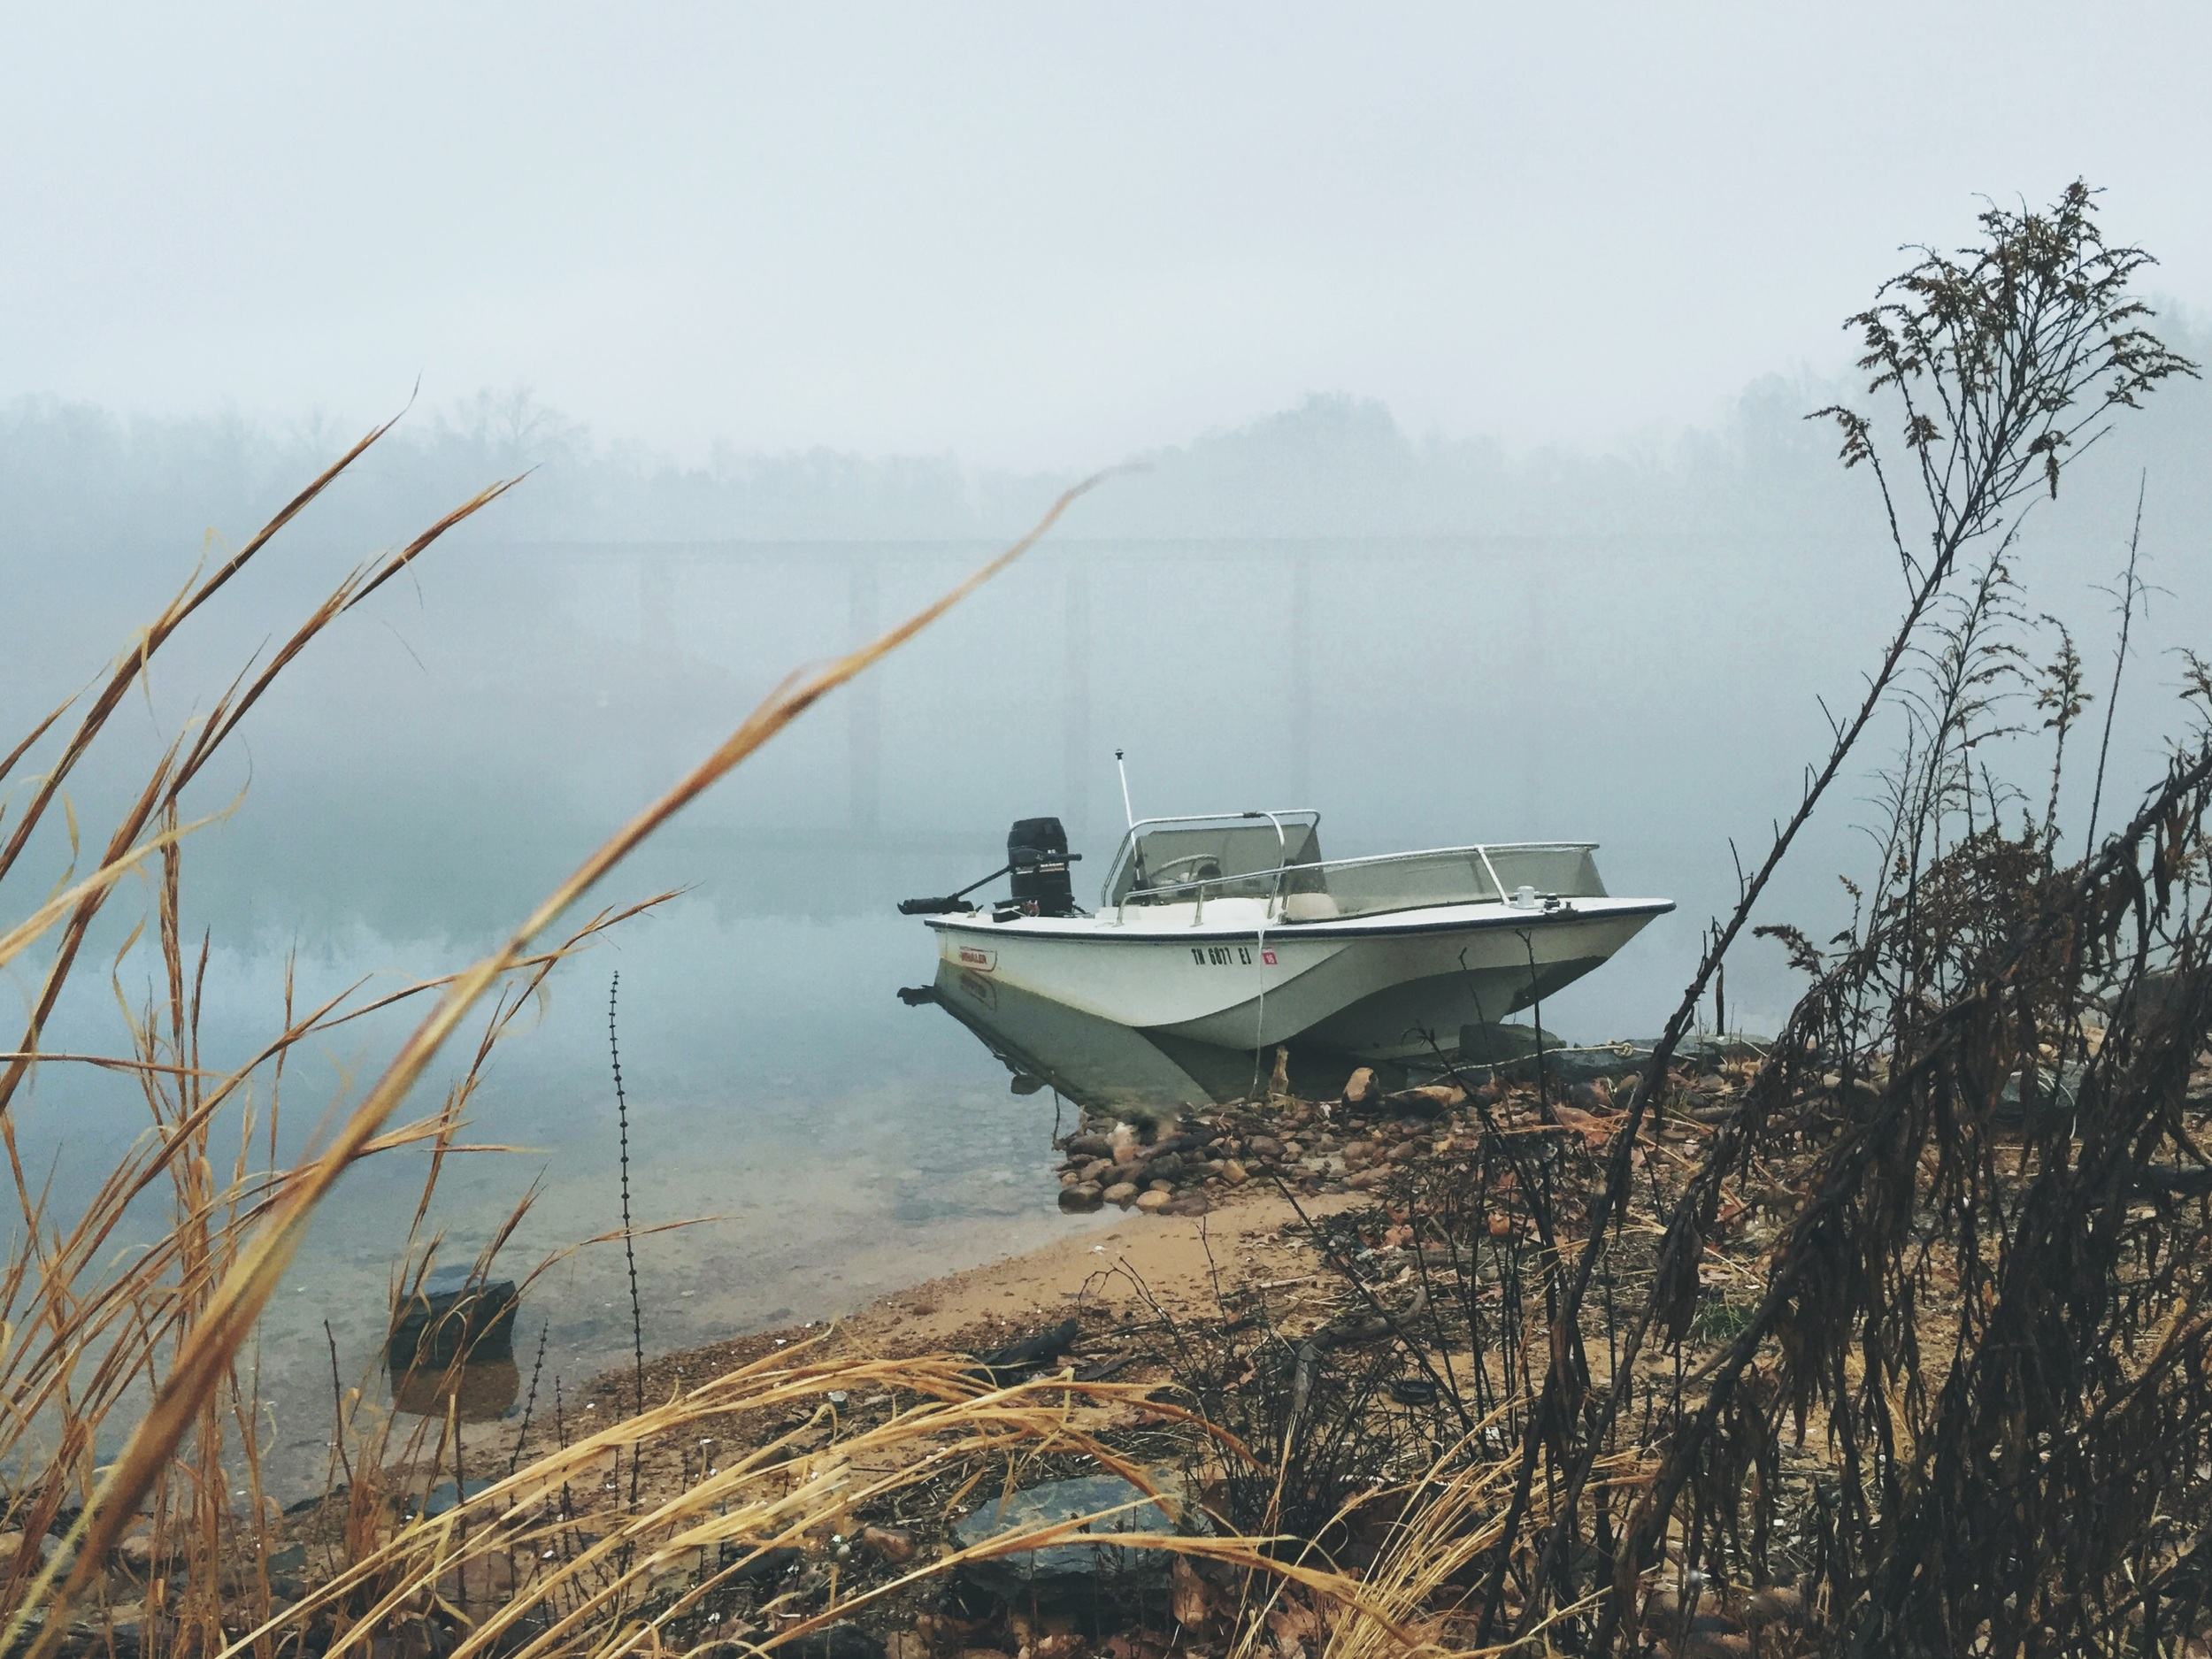 katy-sergent-photography-boston-whaler-newport-boat-fishing-boone-lake.jpg